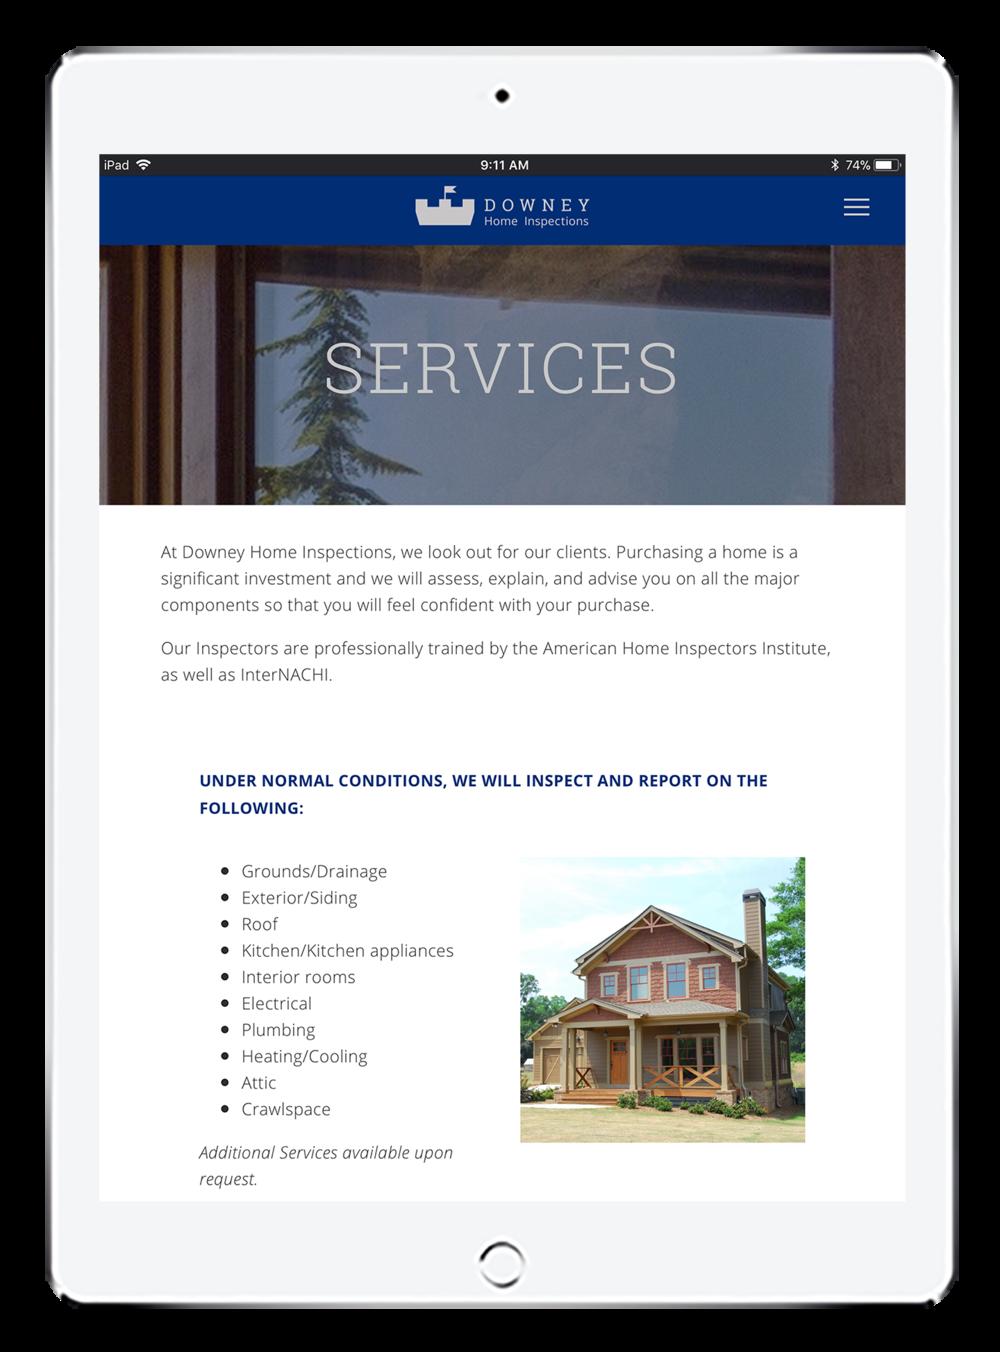 downey_home_inspections_website_ipad_1.jpg